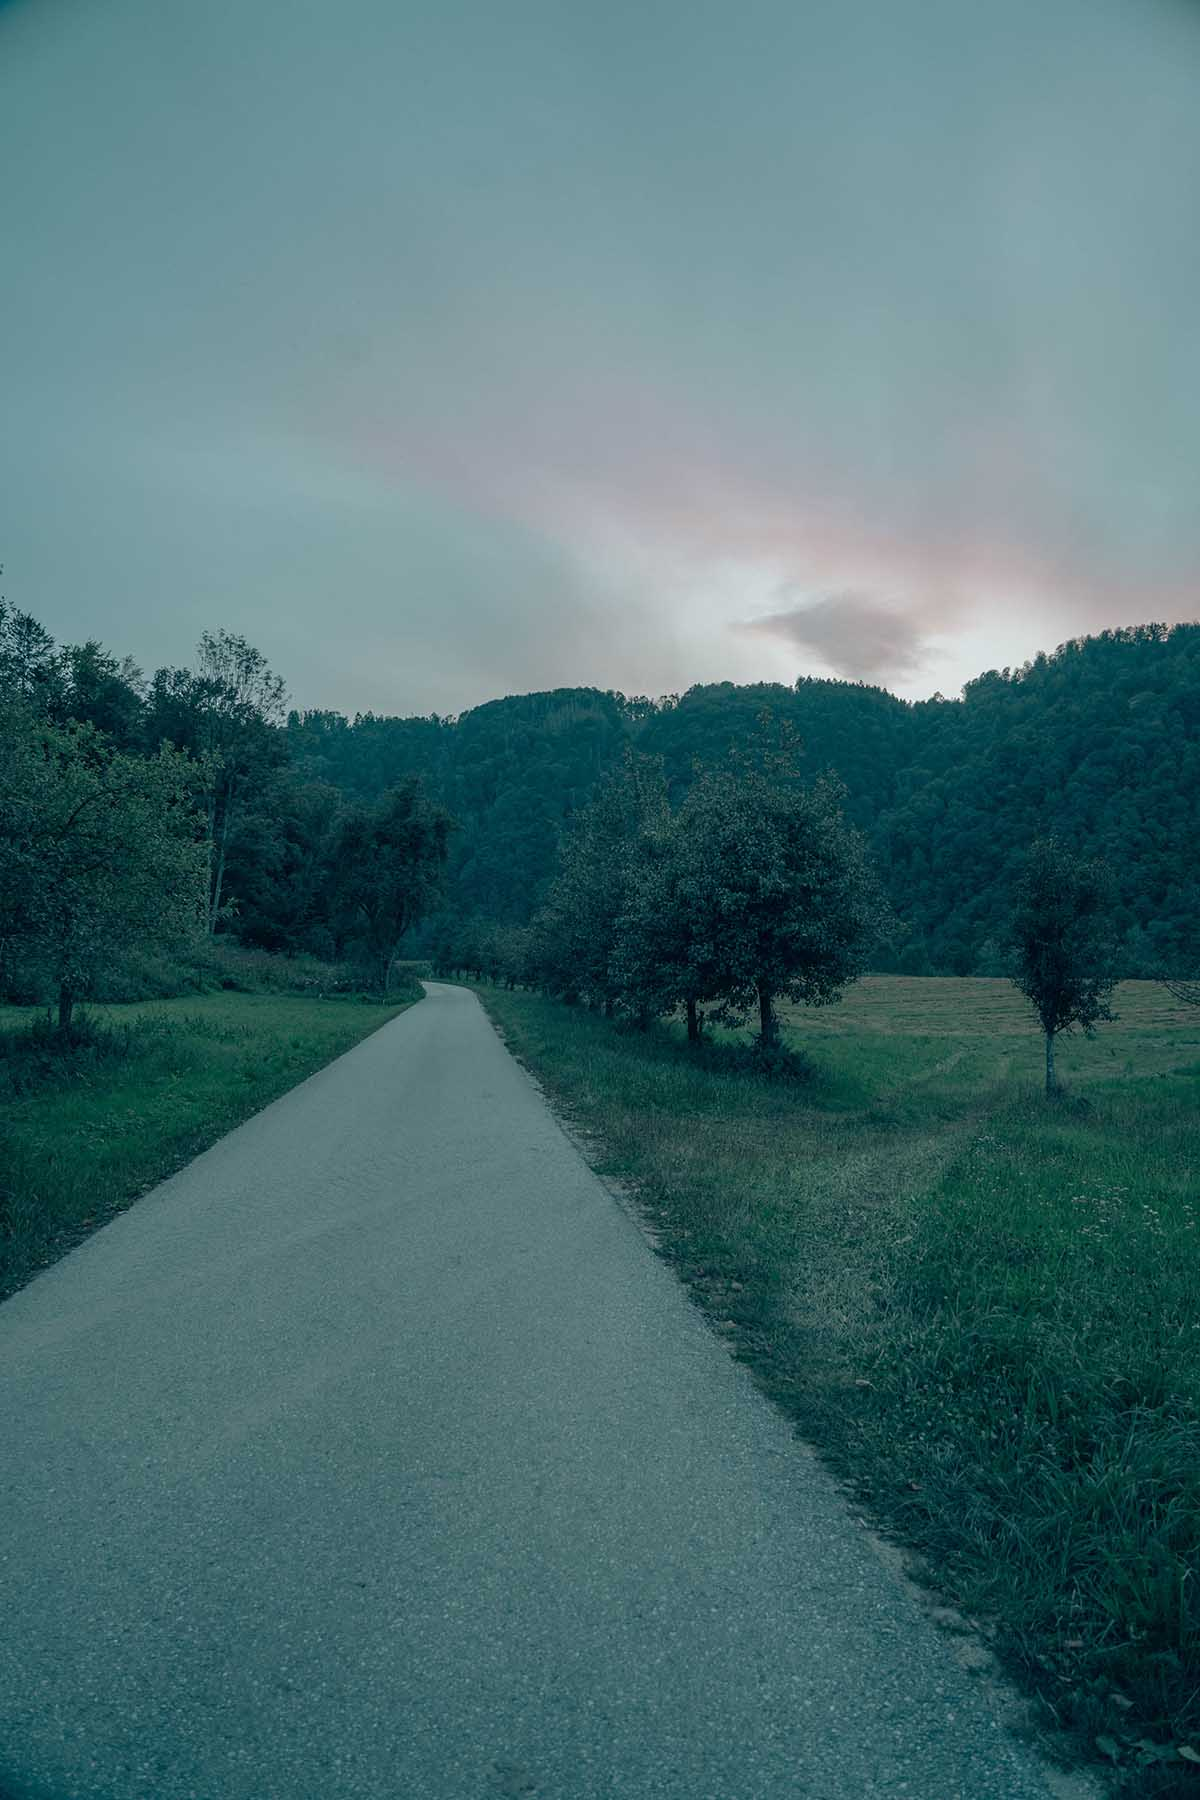 wandern-donausteig-schloegener-schlinge-inzell